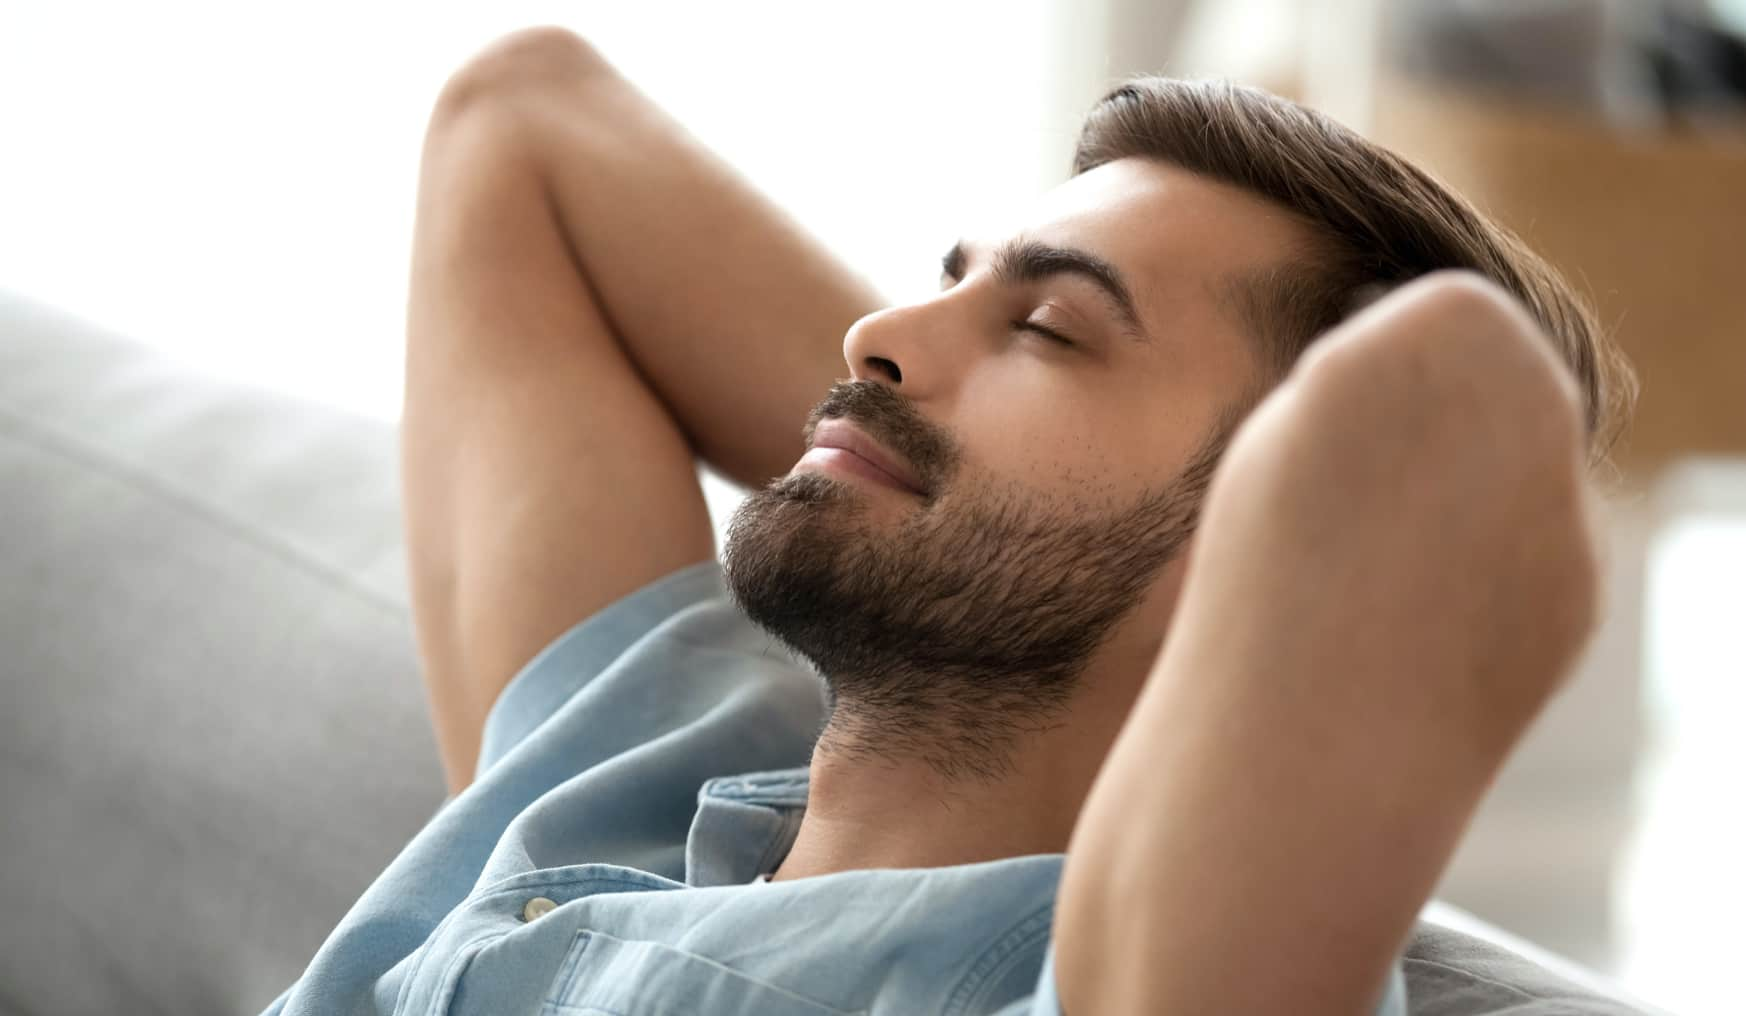 man leaning back on sofa